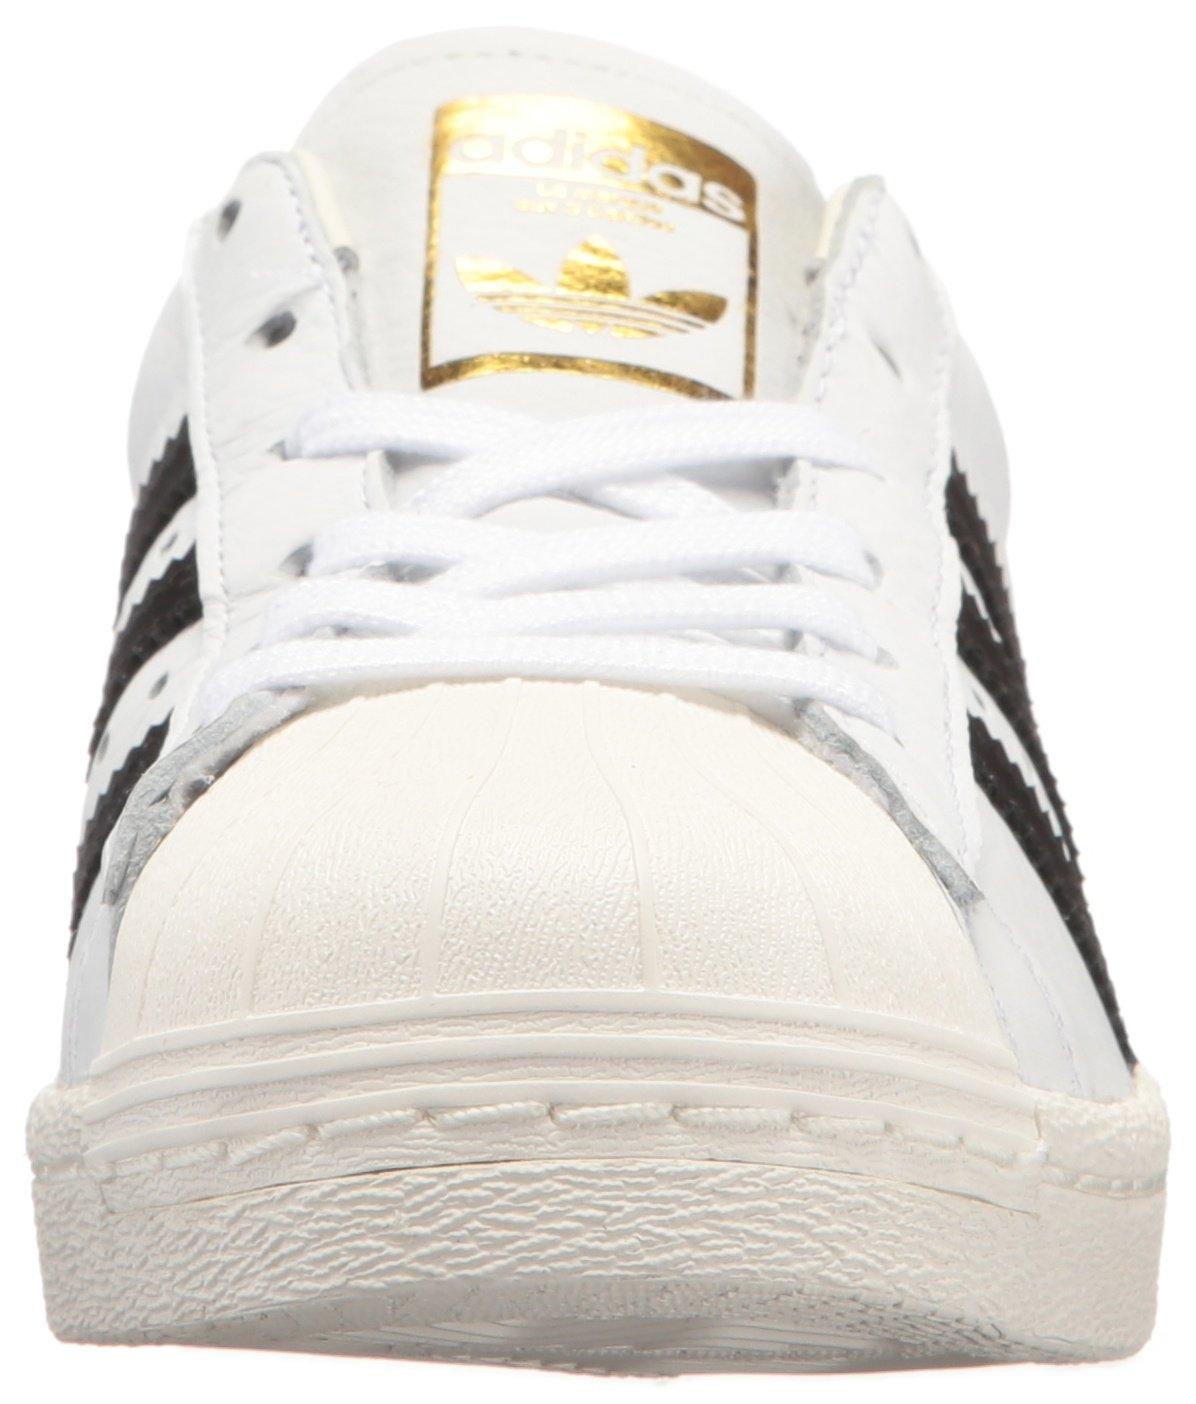 Adidas Originals tenis adidas hombre Superstar originales Foundation